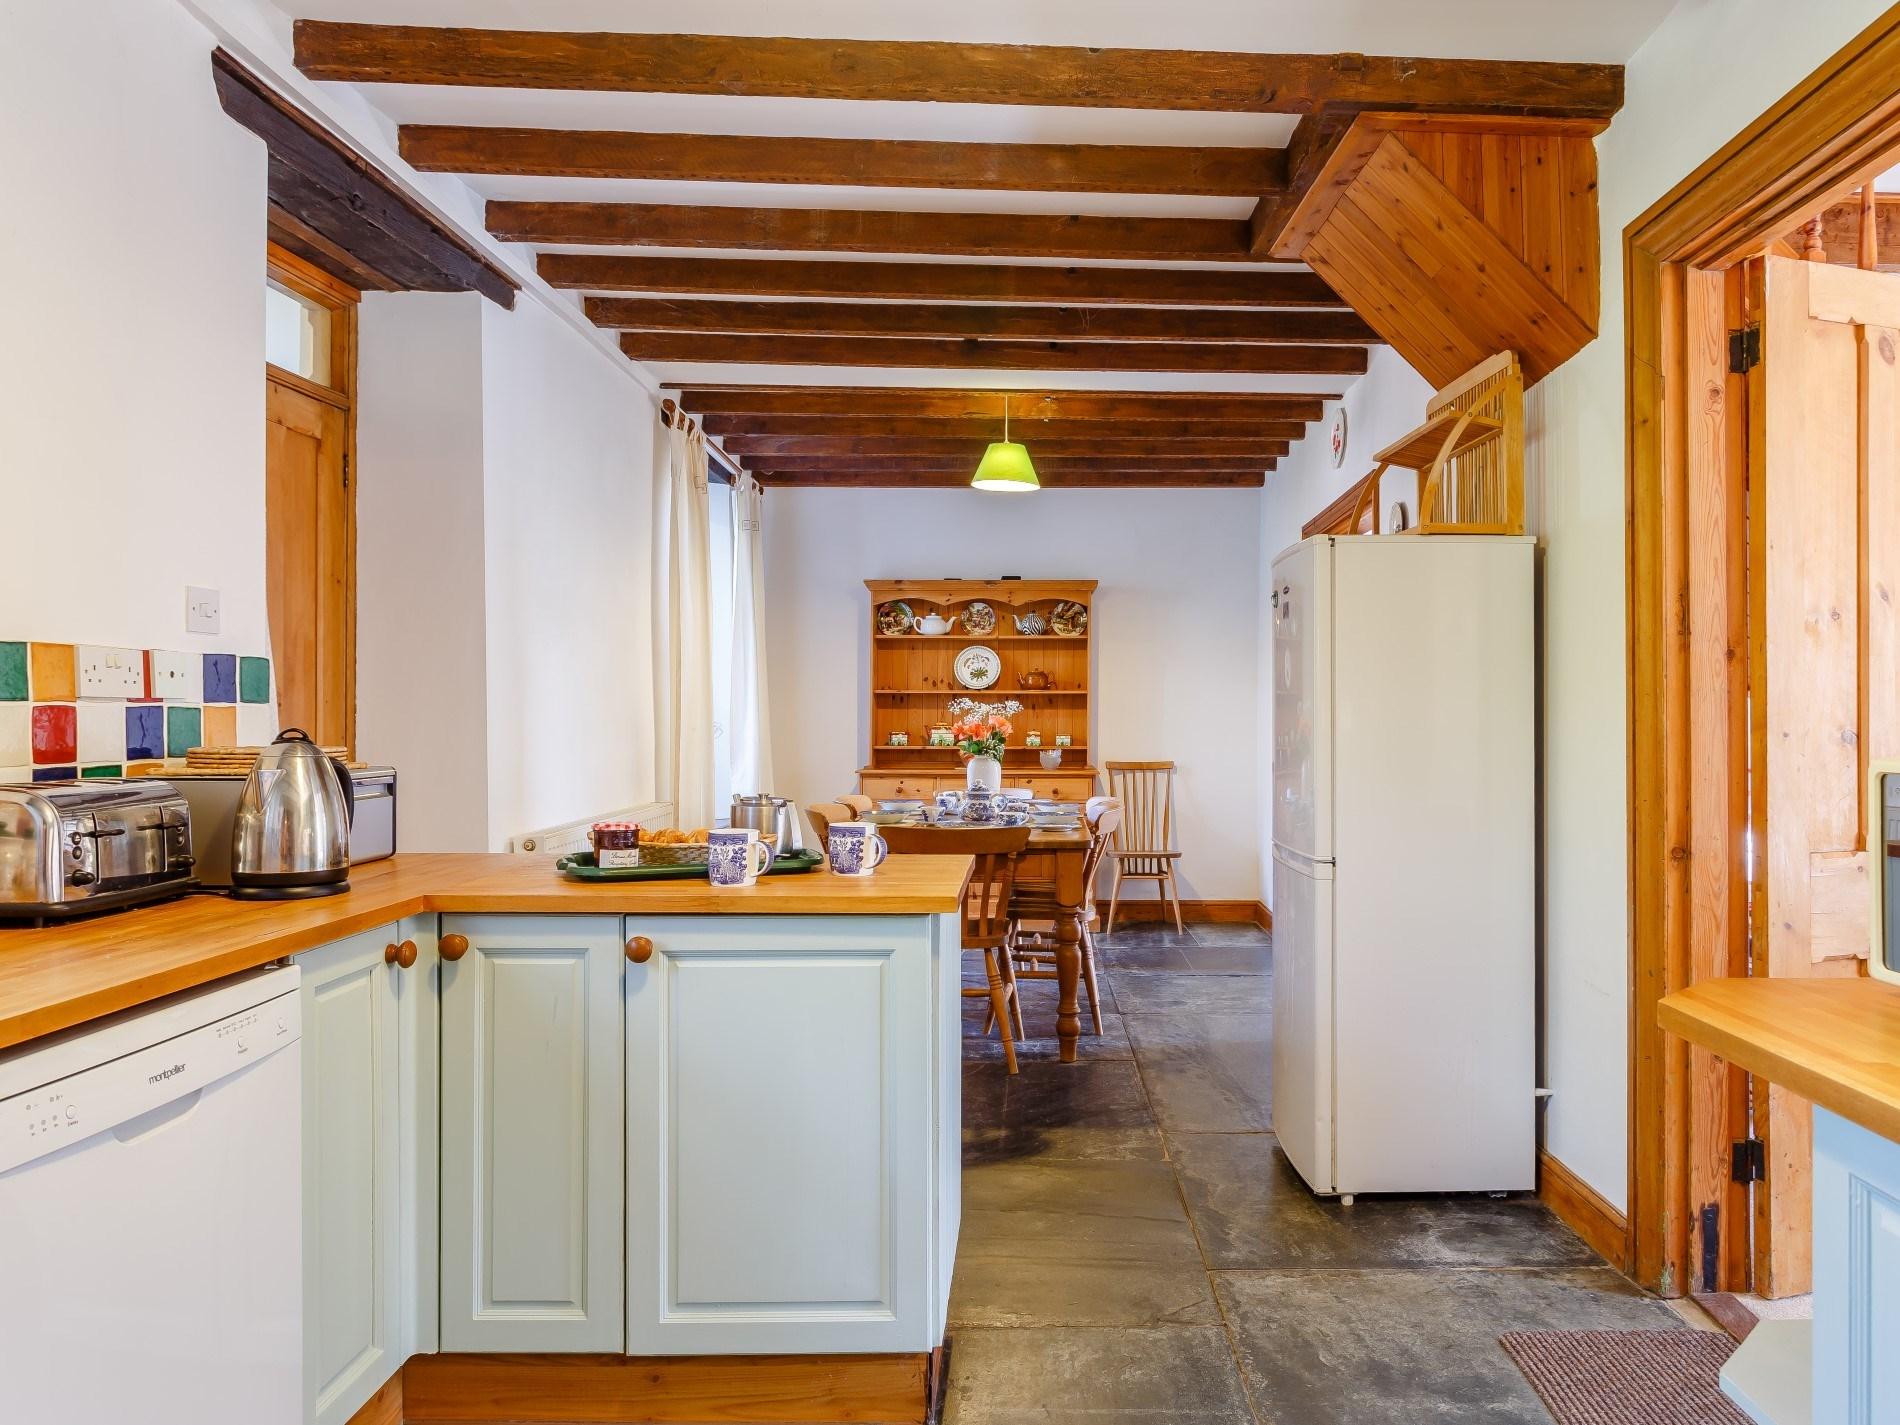 3 Bedroom House in North Cornwall, Cornwall